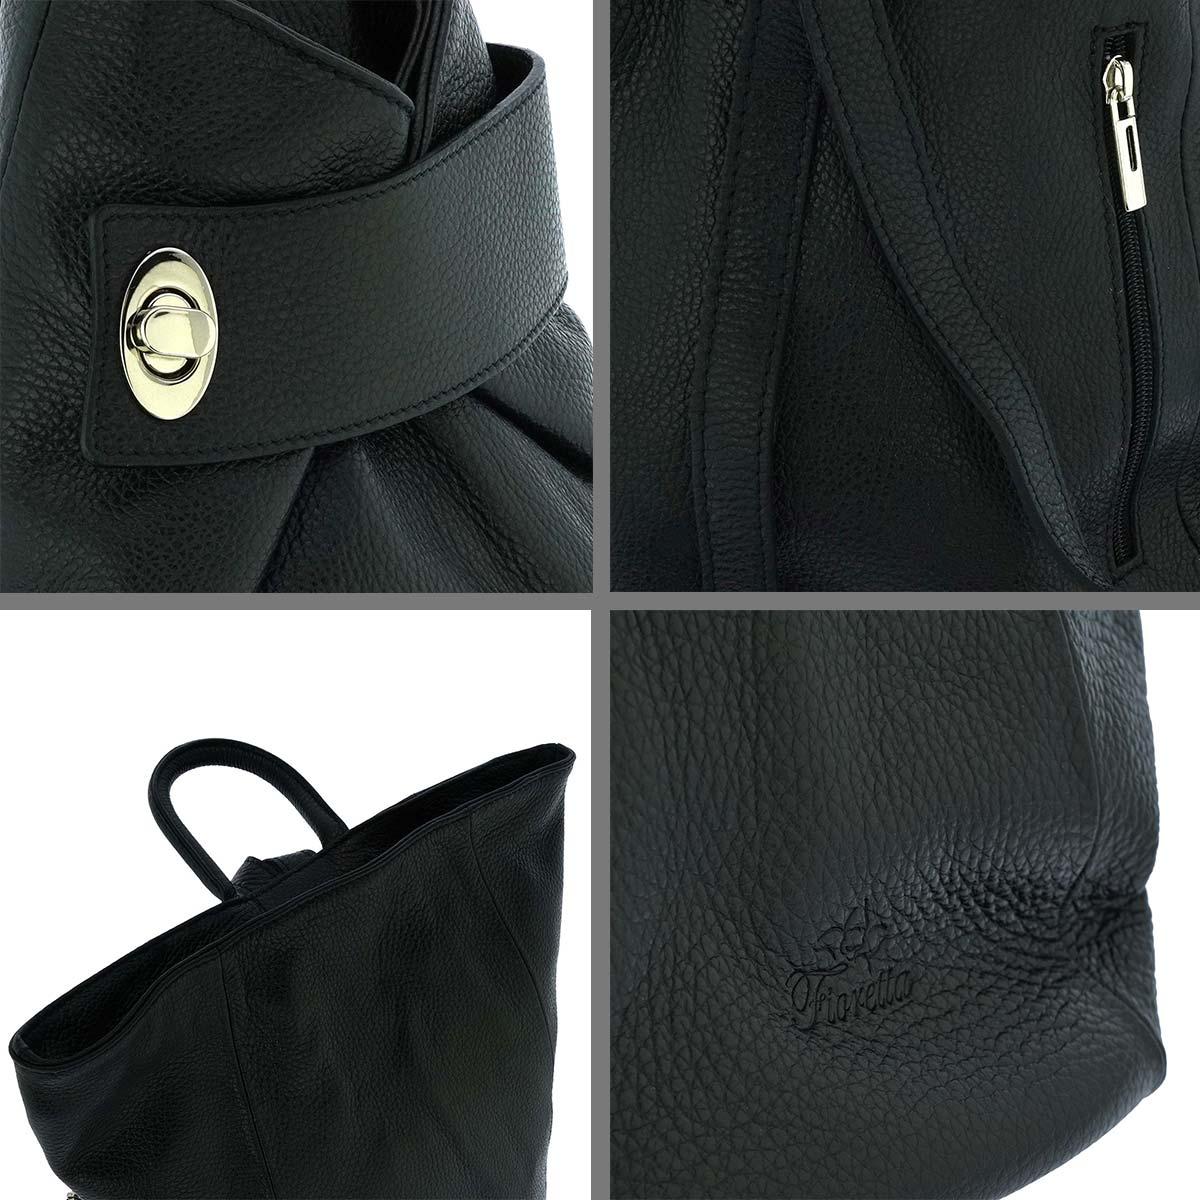 Fioretta Italian Genuine Leather Top Handle Backpack Handbag For Women - Black